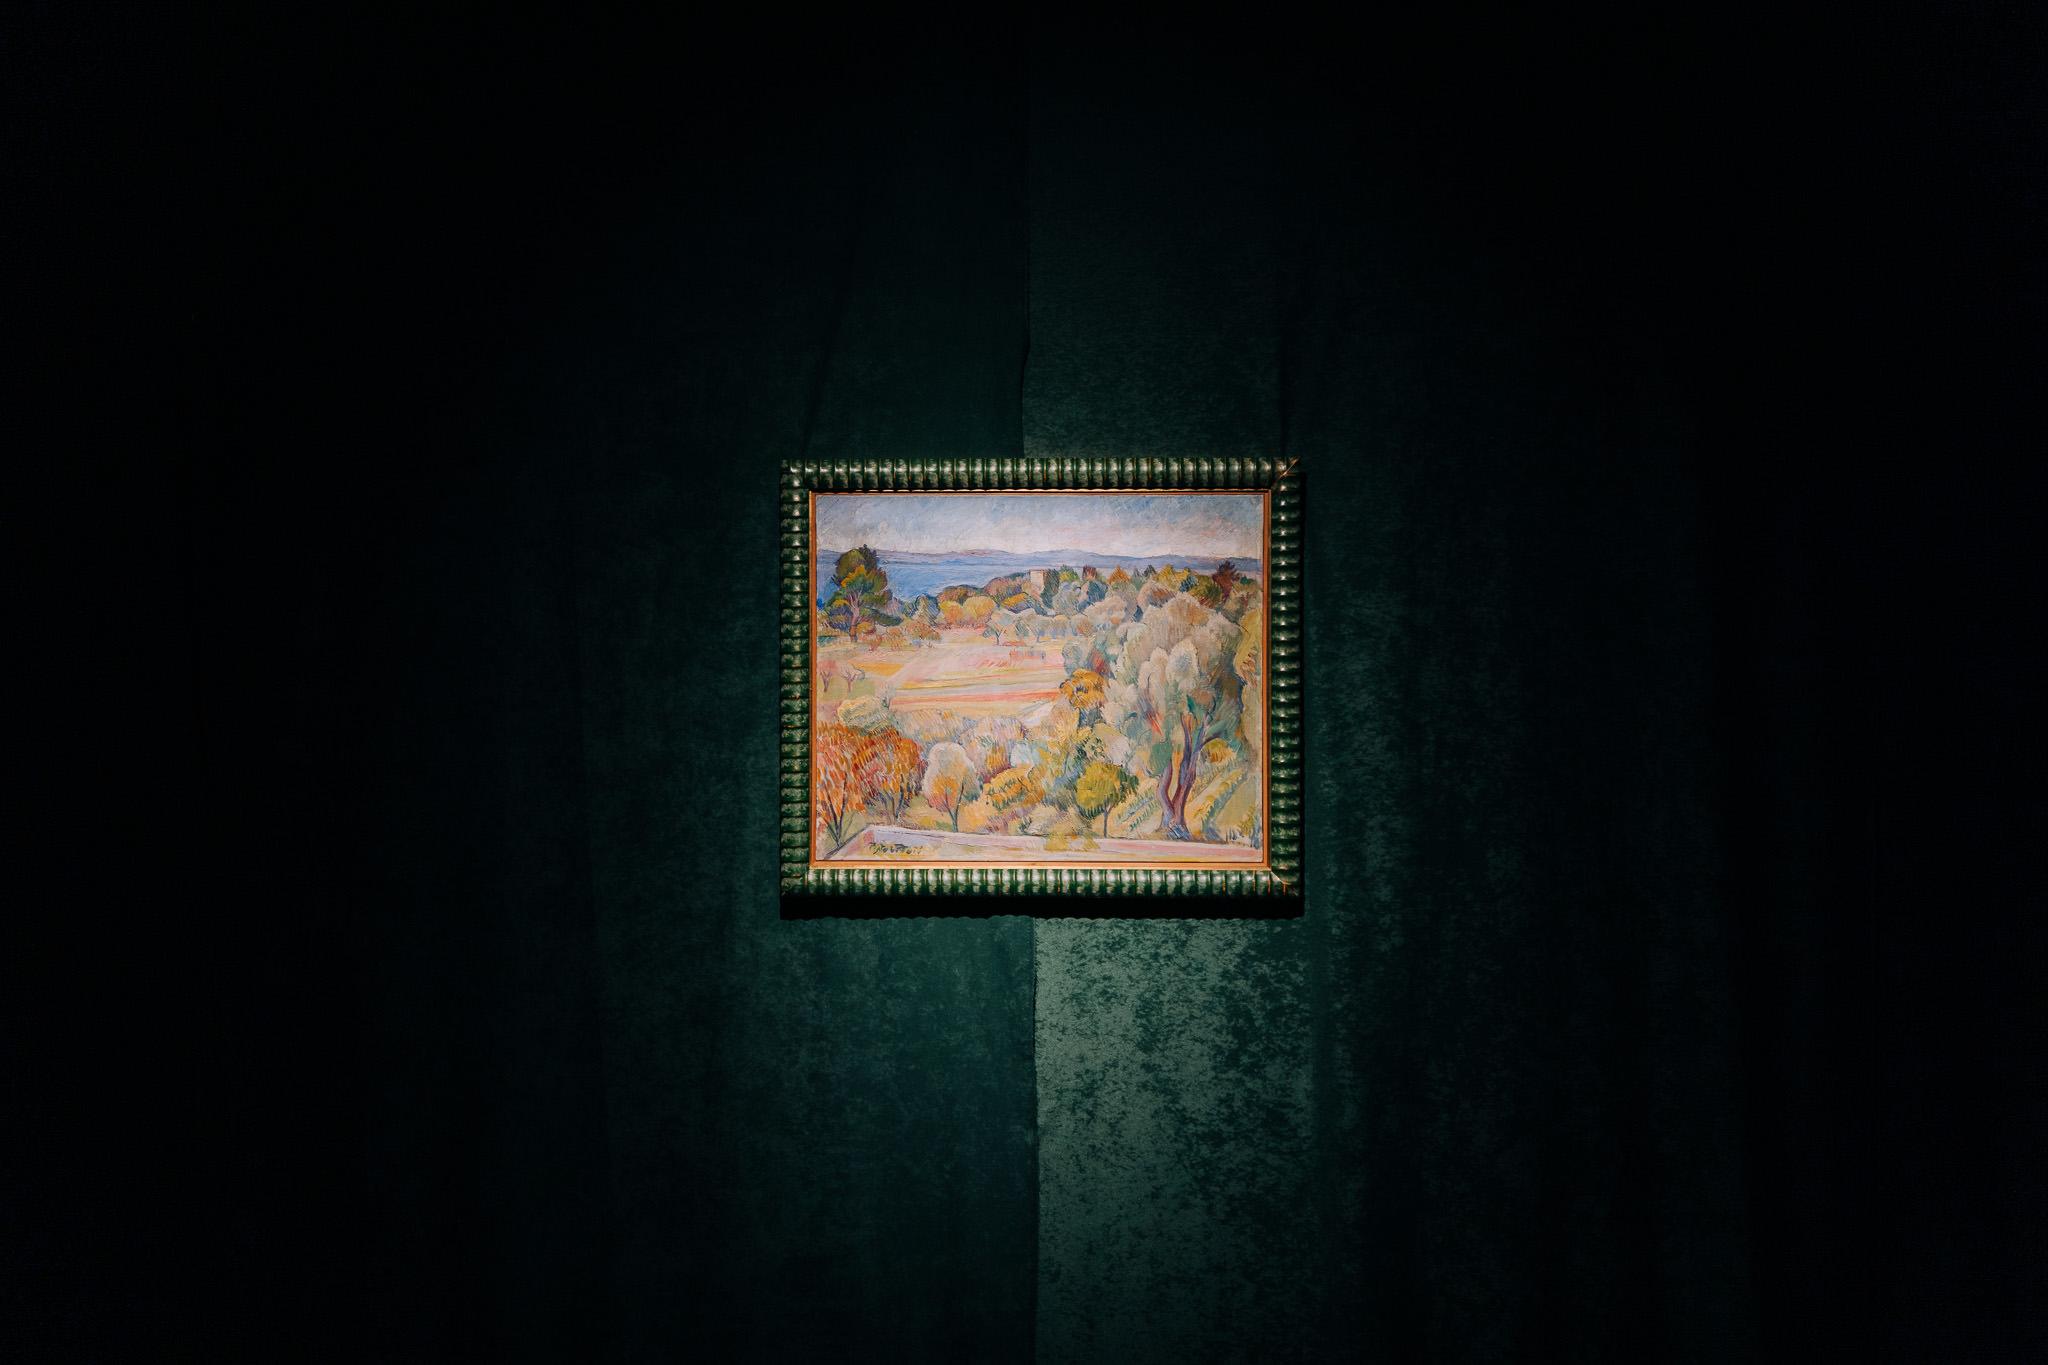 Soba za prepuštanje umetnosti, galerija matice srpske